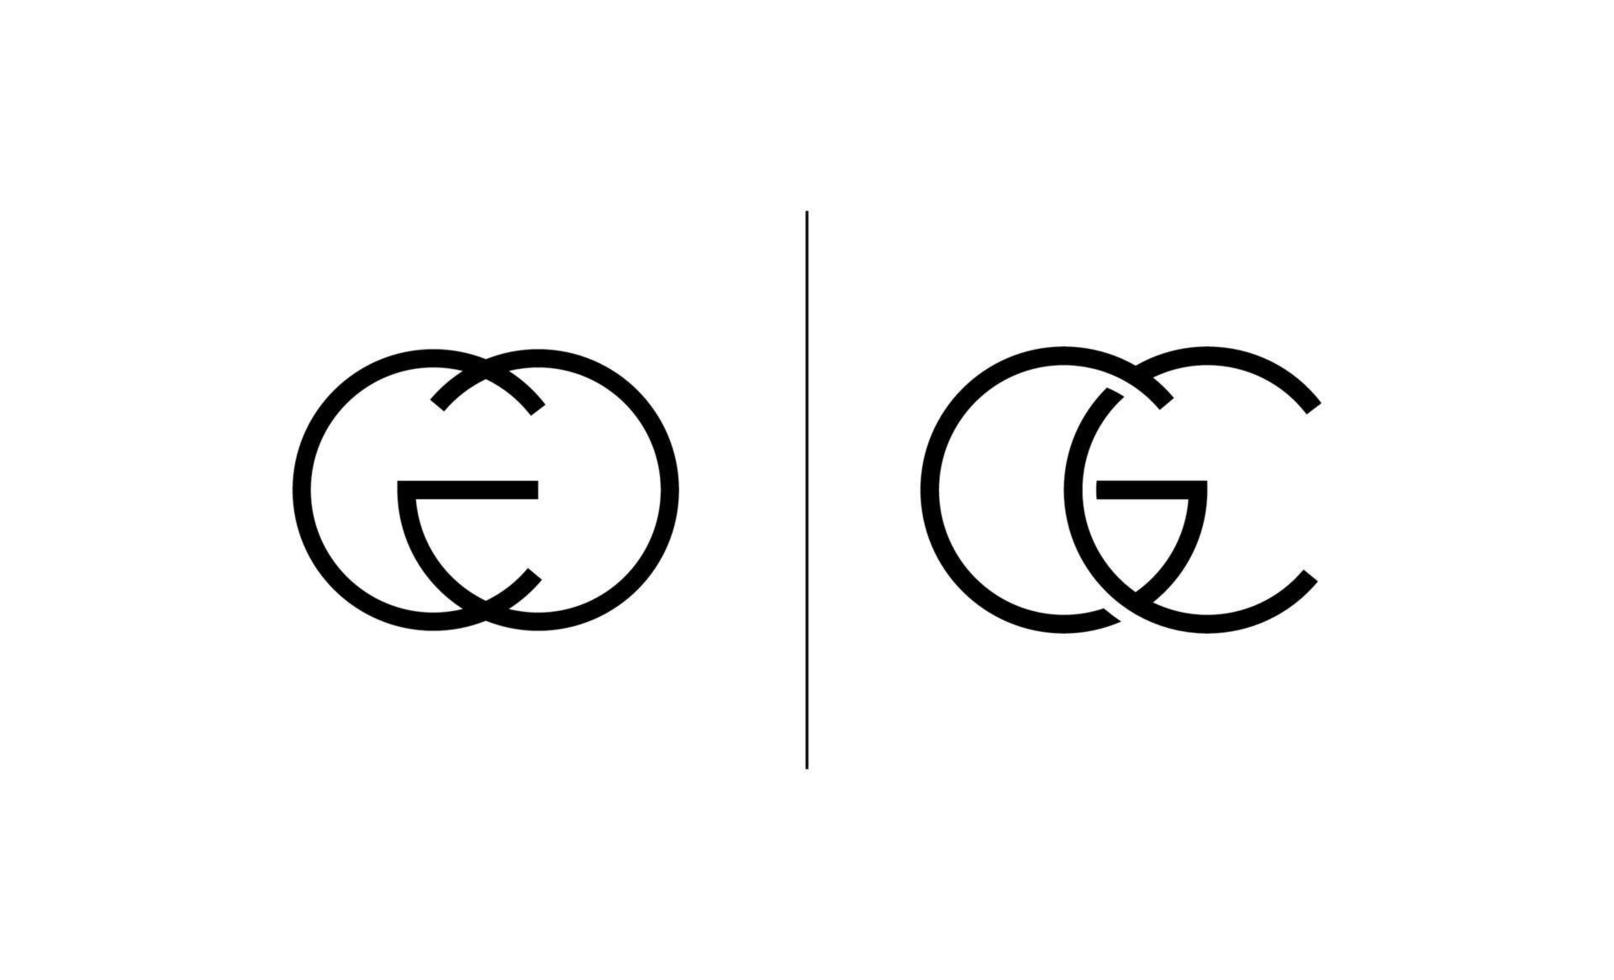 första cg, gc logotyp mall design vektor